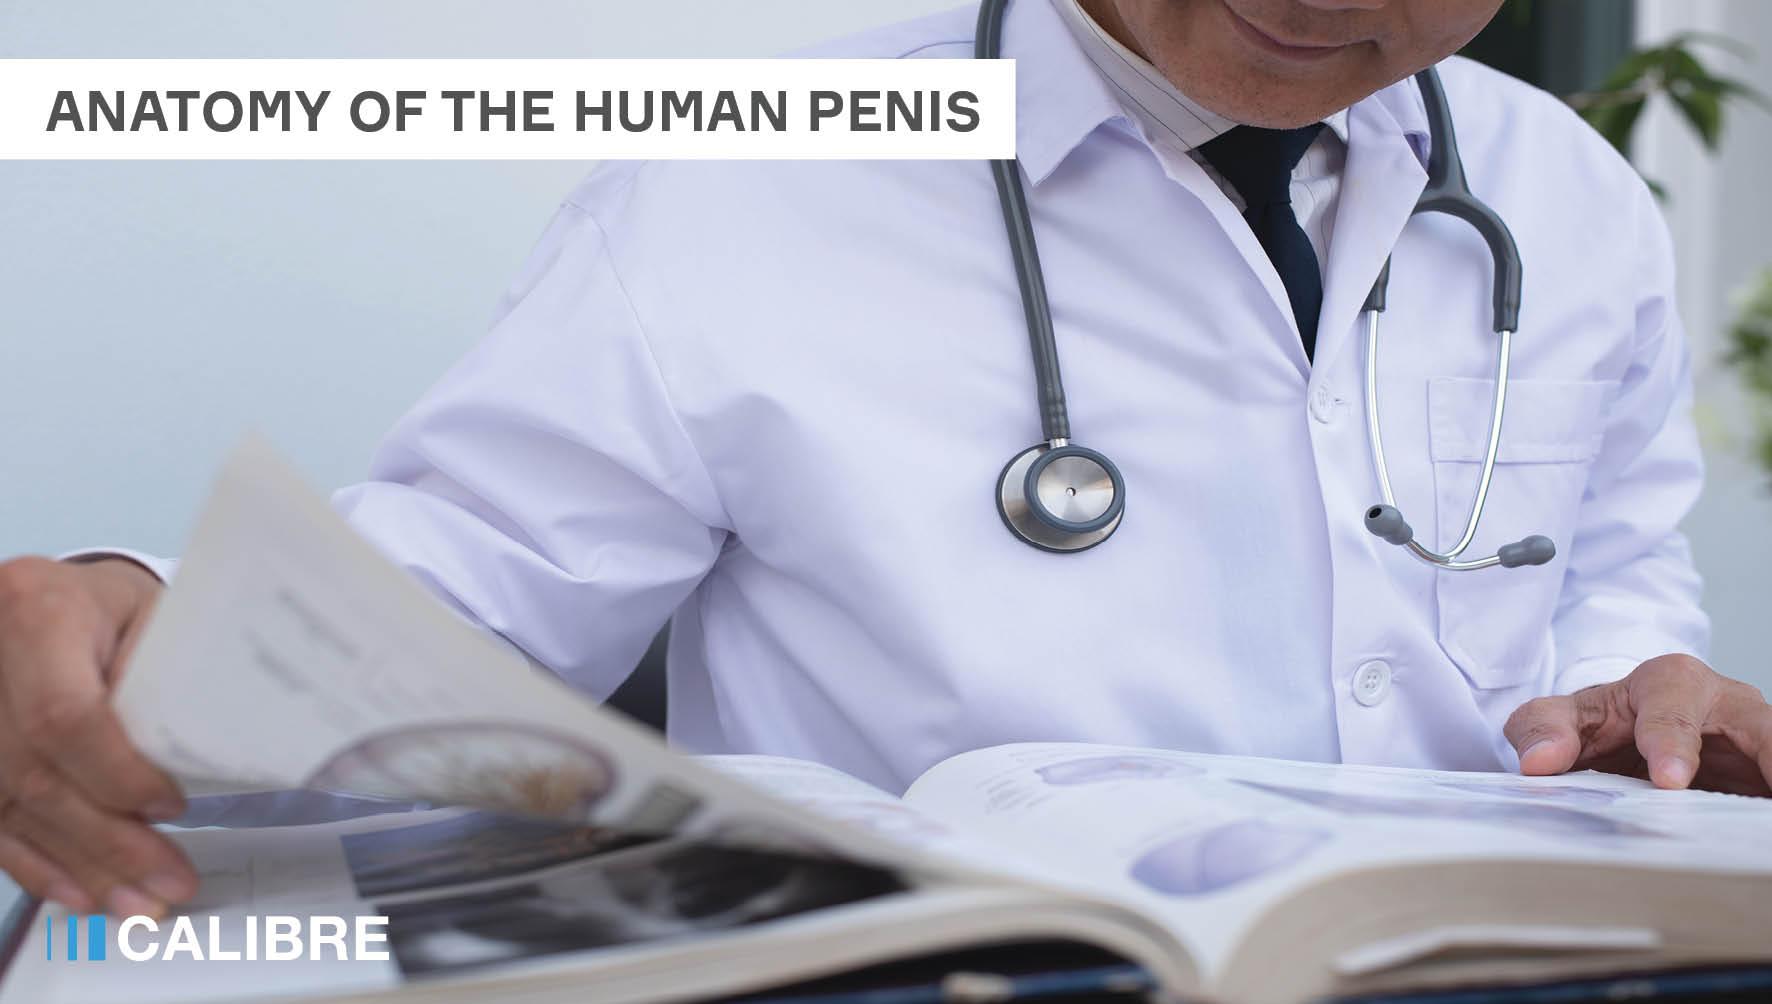 Anatomy of the human penis